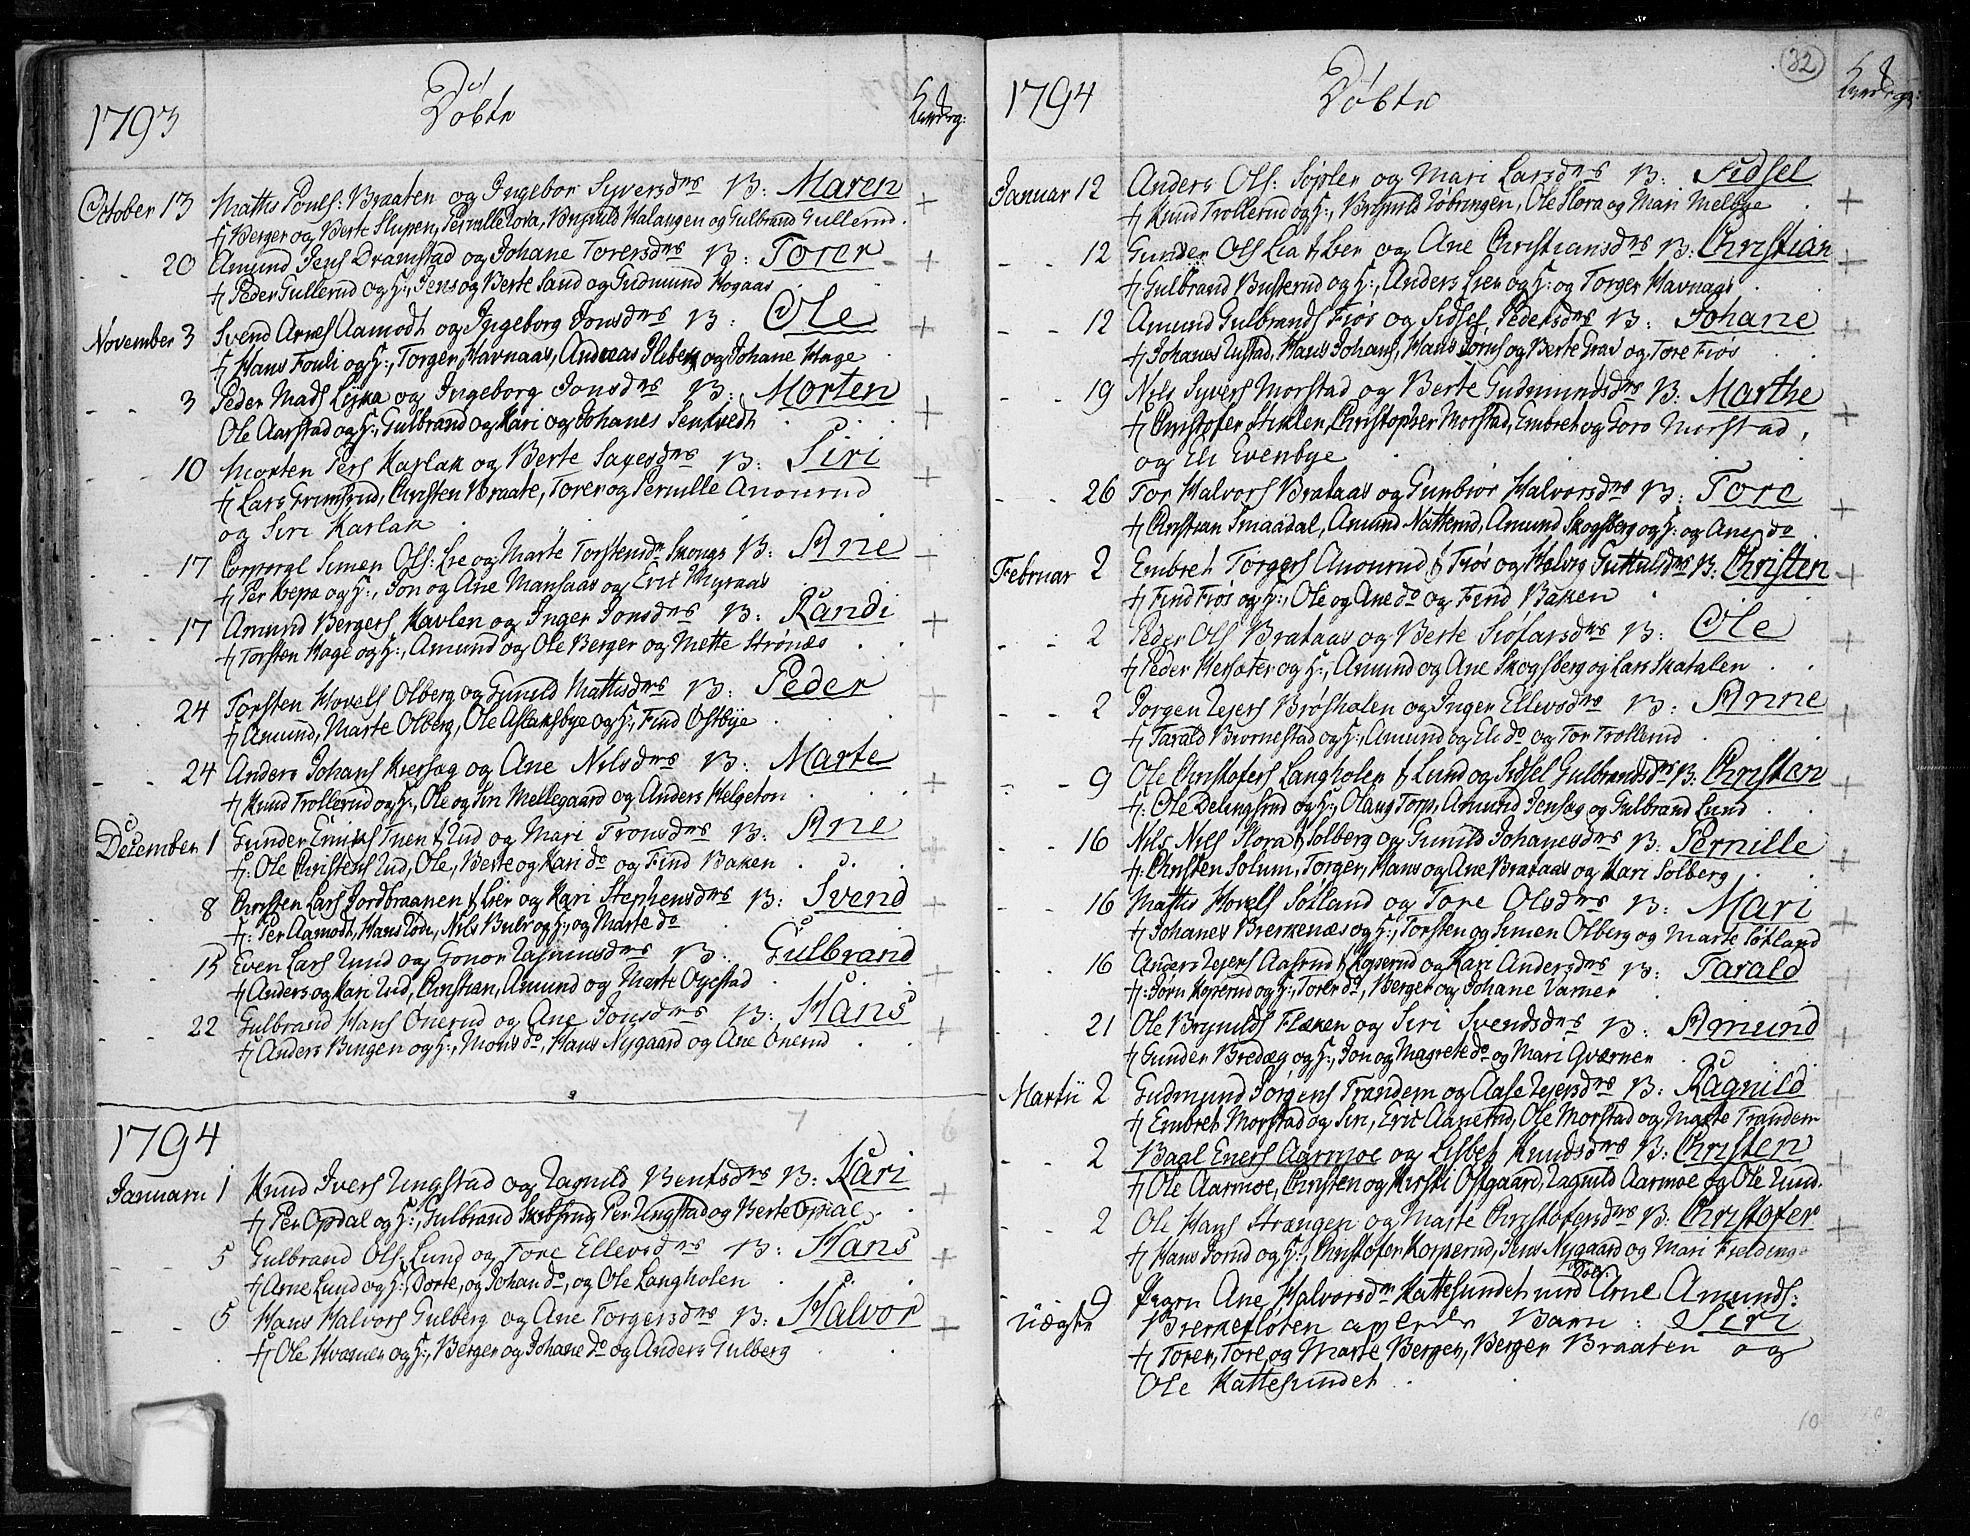 SAO, Trøgstad prestekontor Kirkebøker, F/Fa/L0005: Parish register (official) no. I 5, 1784-1814, p. 32